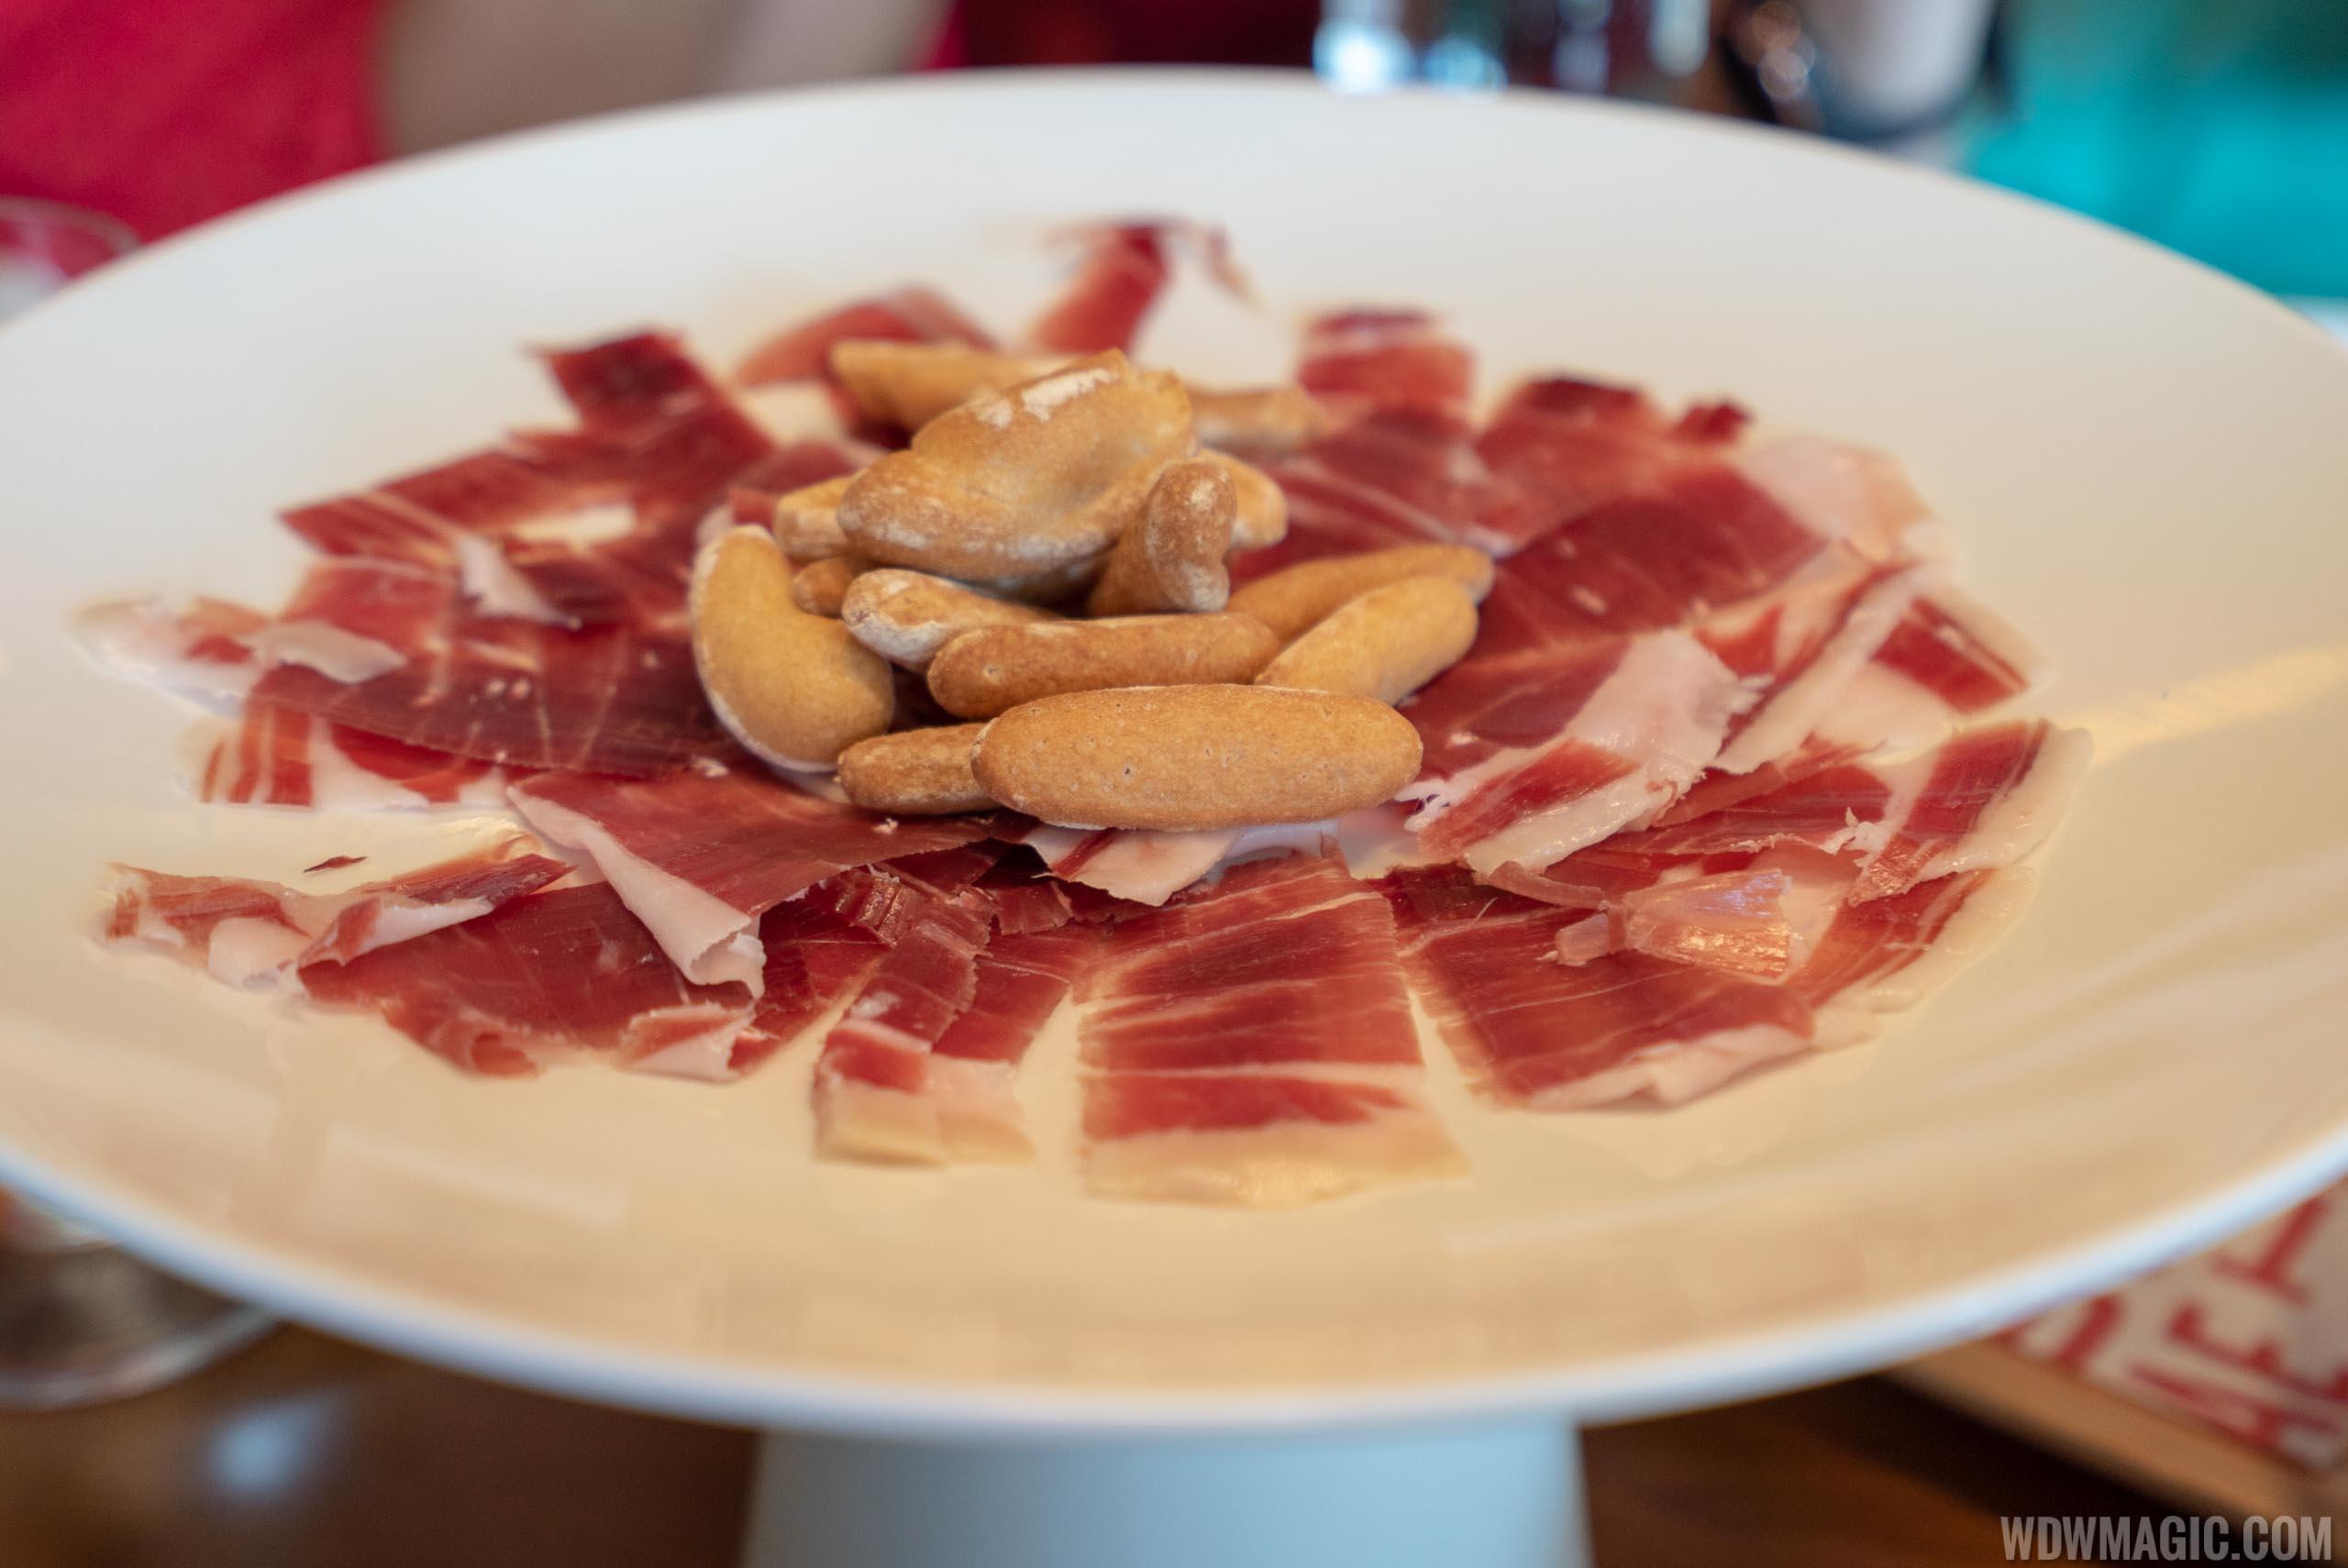 Chef's tasting menu: José's Way - 24-month cured serrano ham